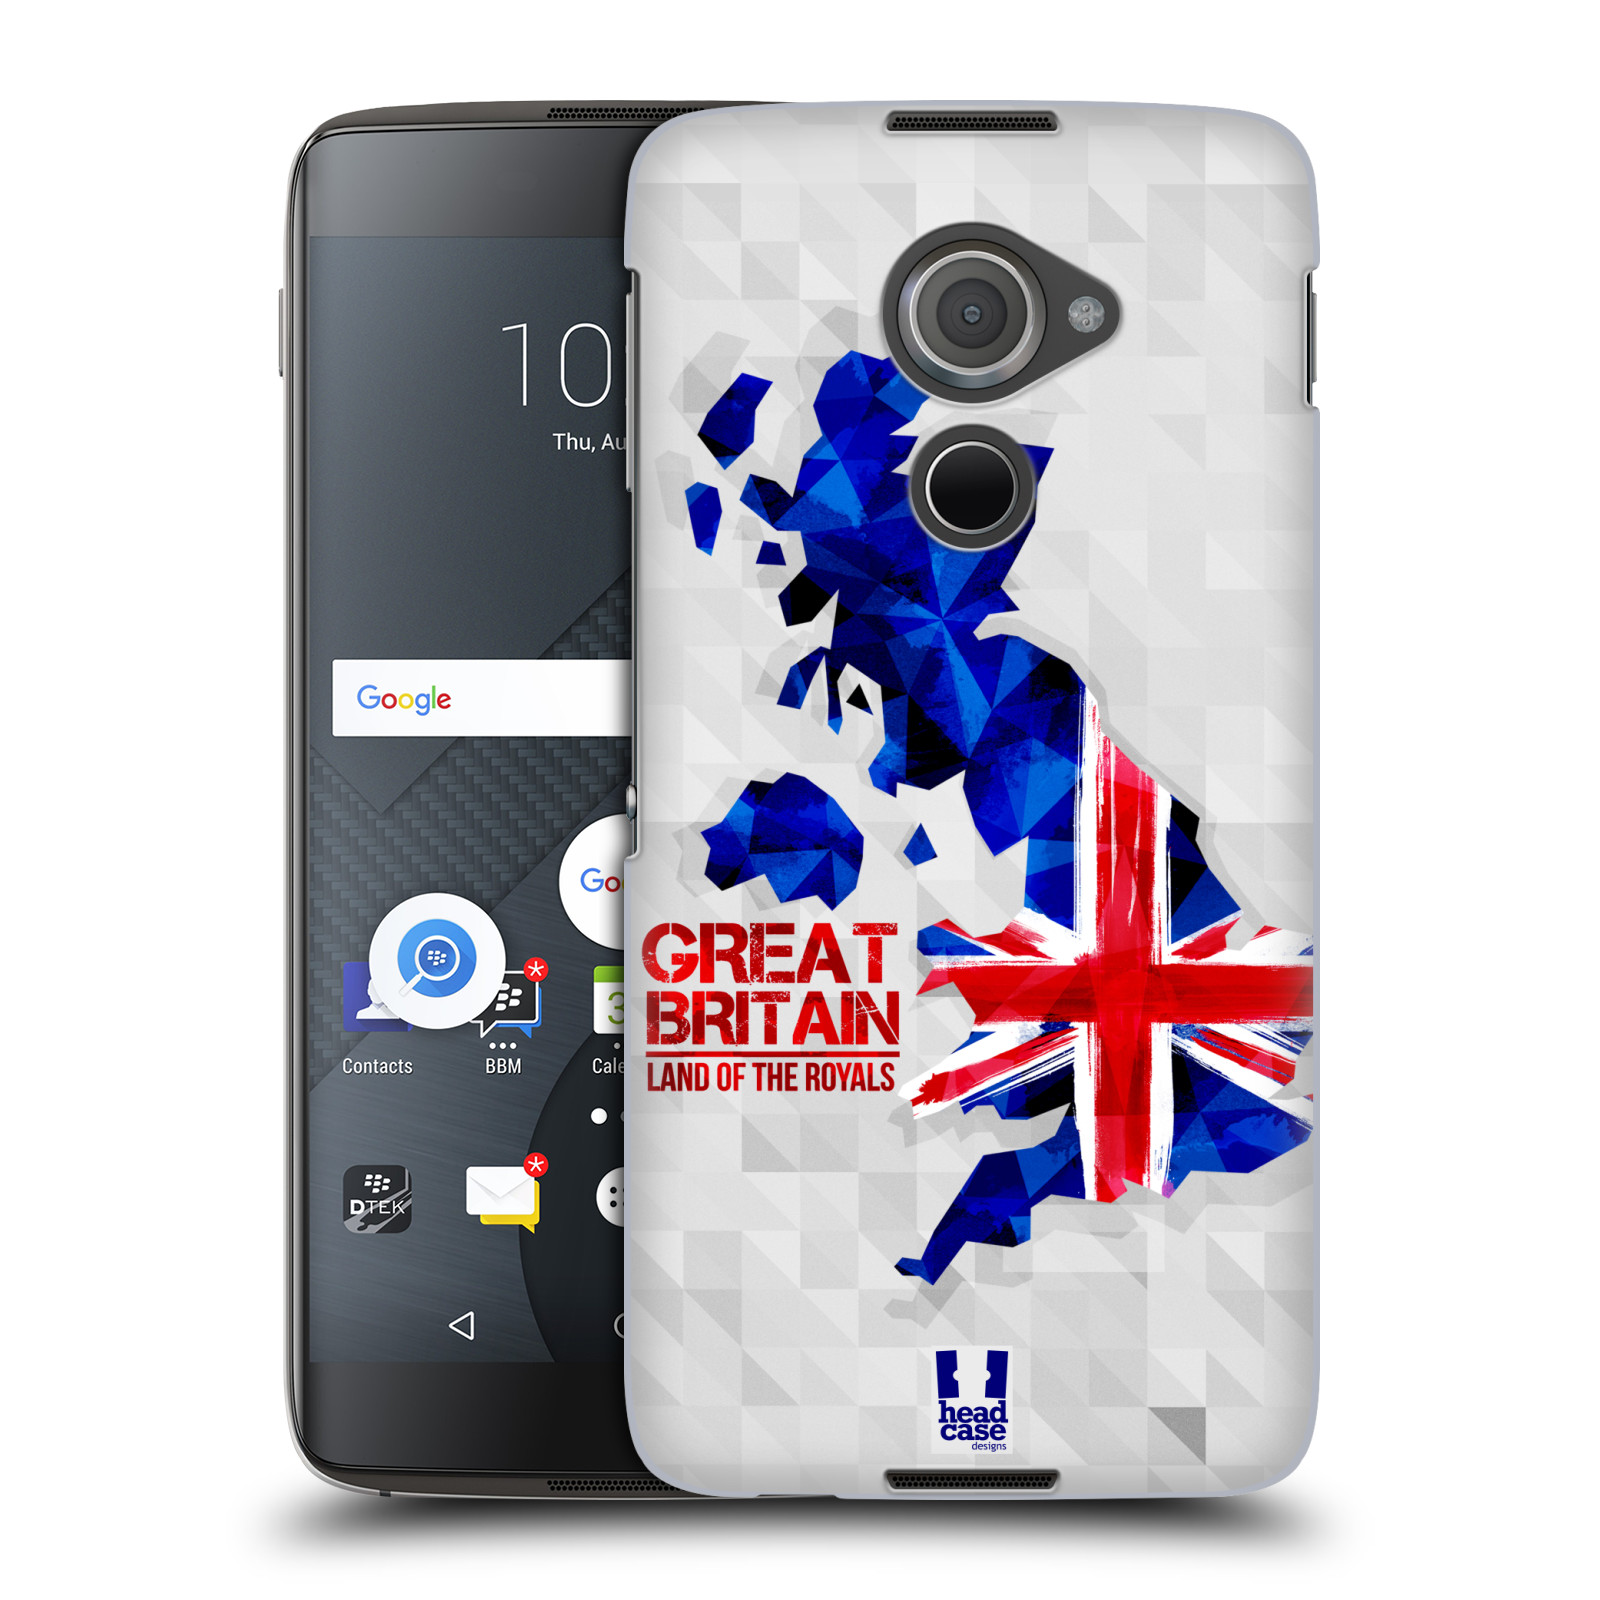 Plastové pouzdro na mobil Blackberry DTEK60 (Argon) - Head Case GEOMAPA VELKÁ BRTÁNIE (Plastový kryt či obal na mobilní telefon Blackberry DTEK60 (Argon))